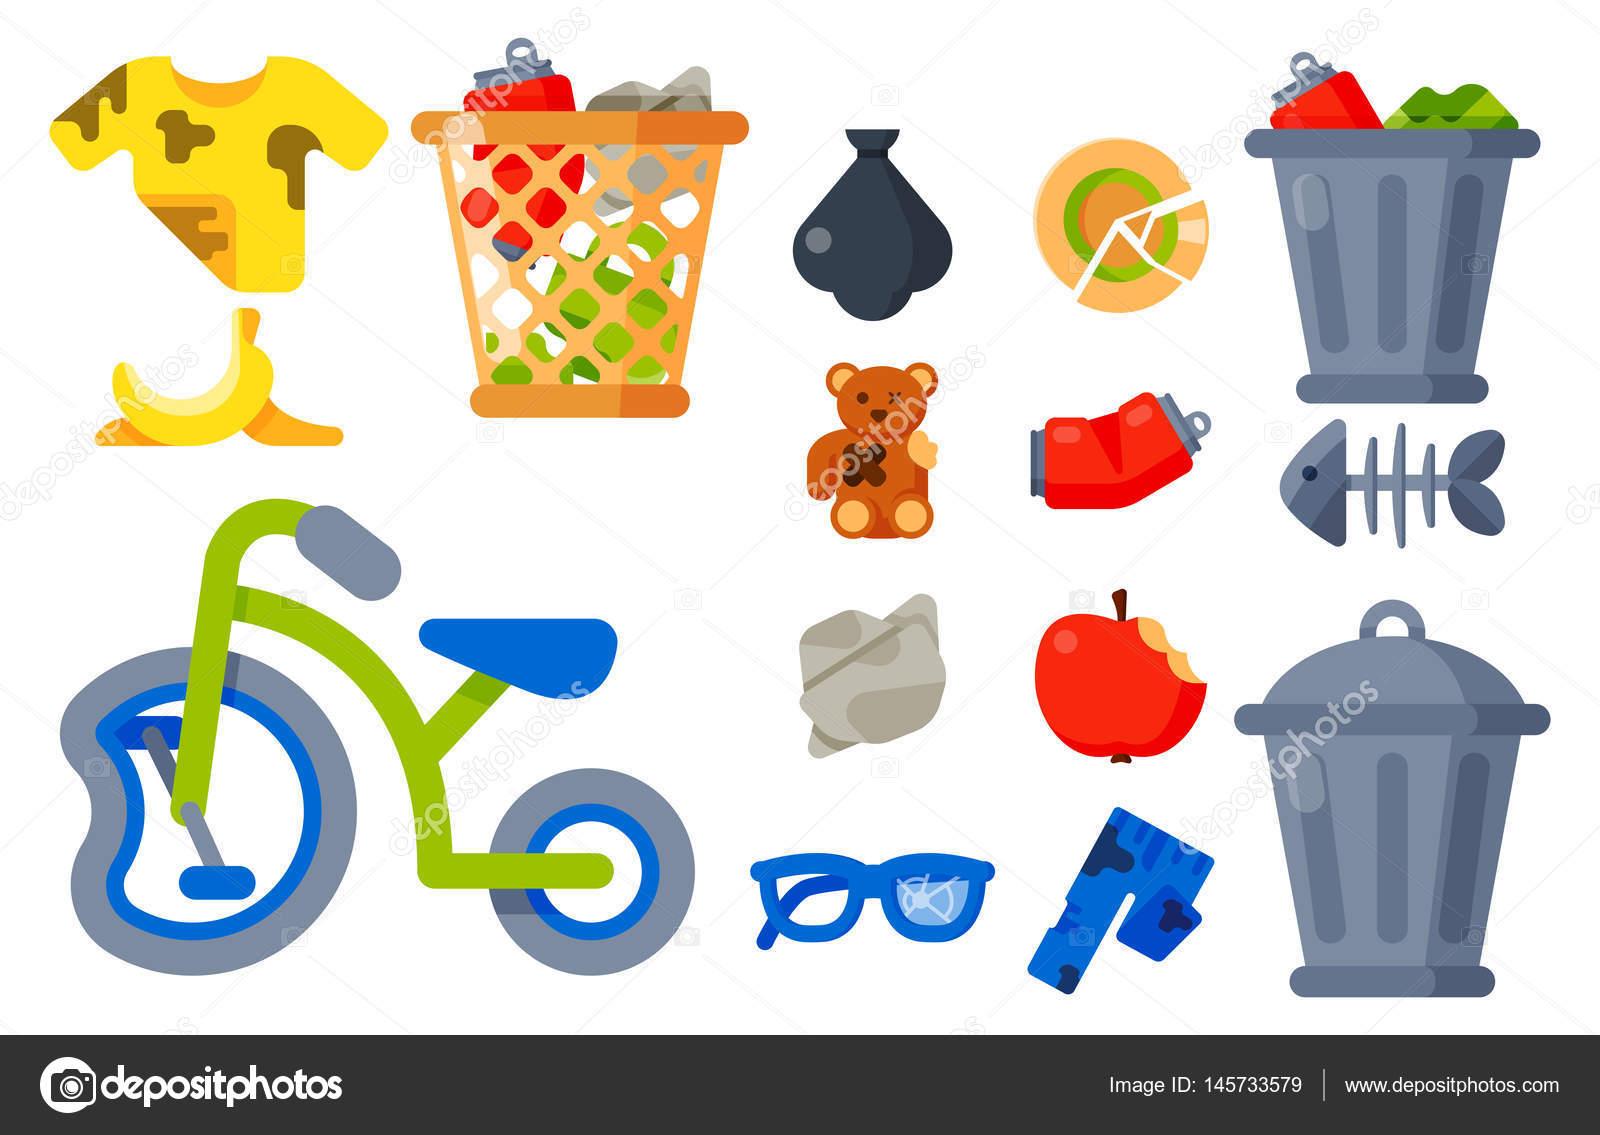 Icones De Lixo Lixo Domestico Lixo Ilustracao Reciclagem Conceito De